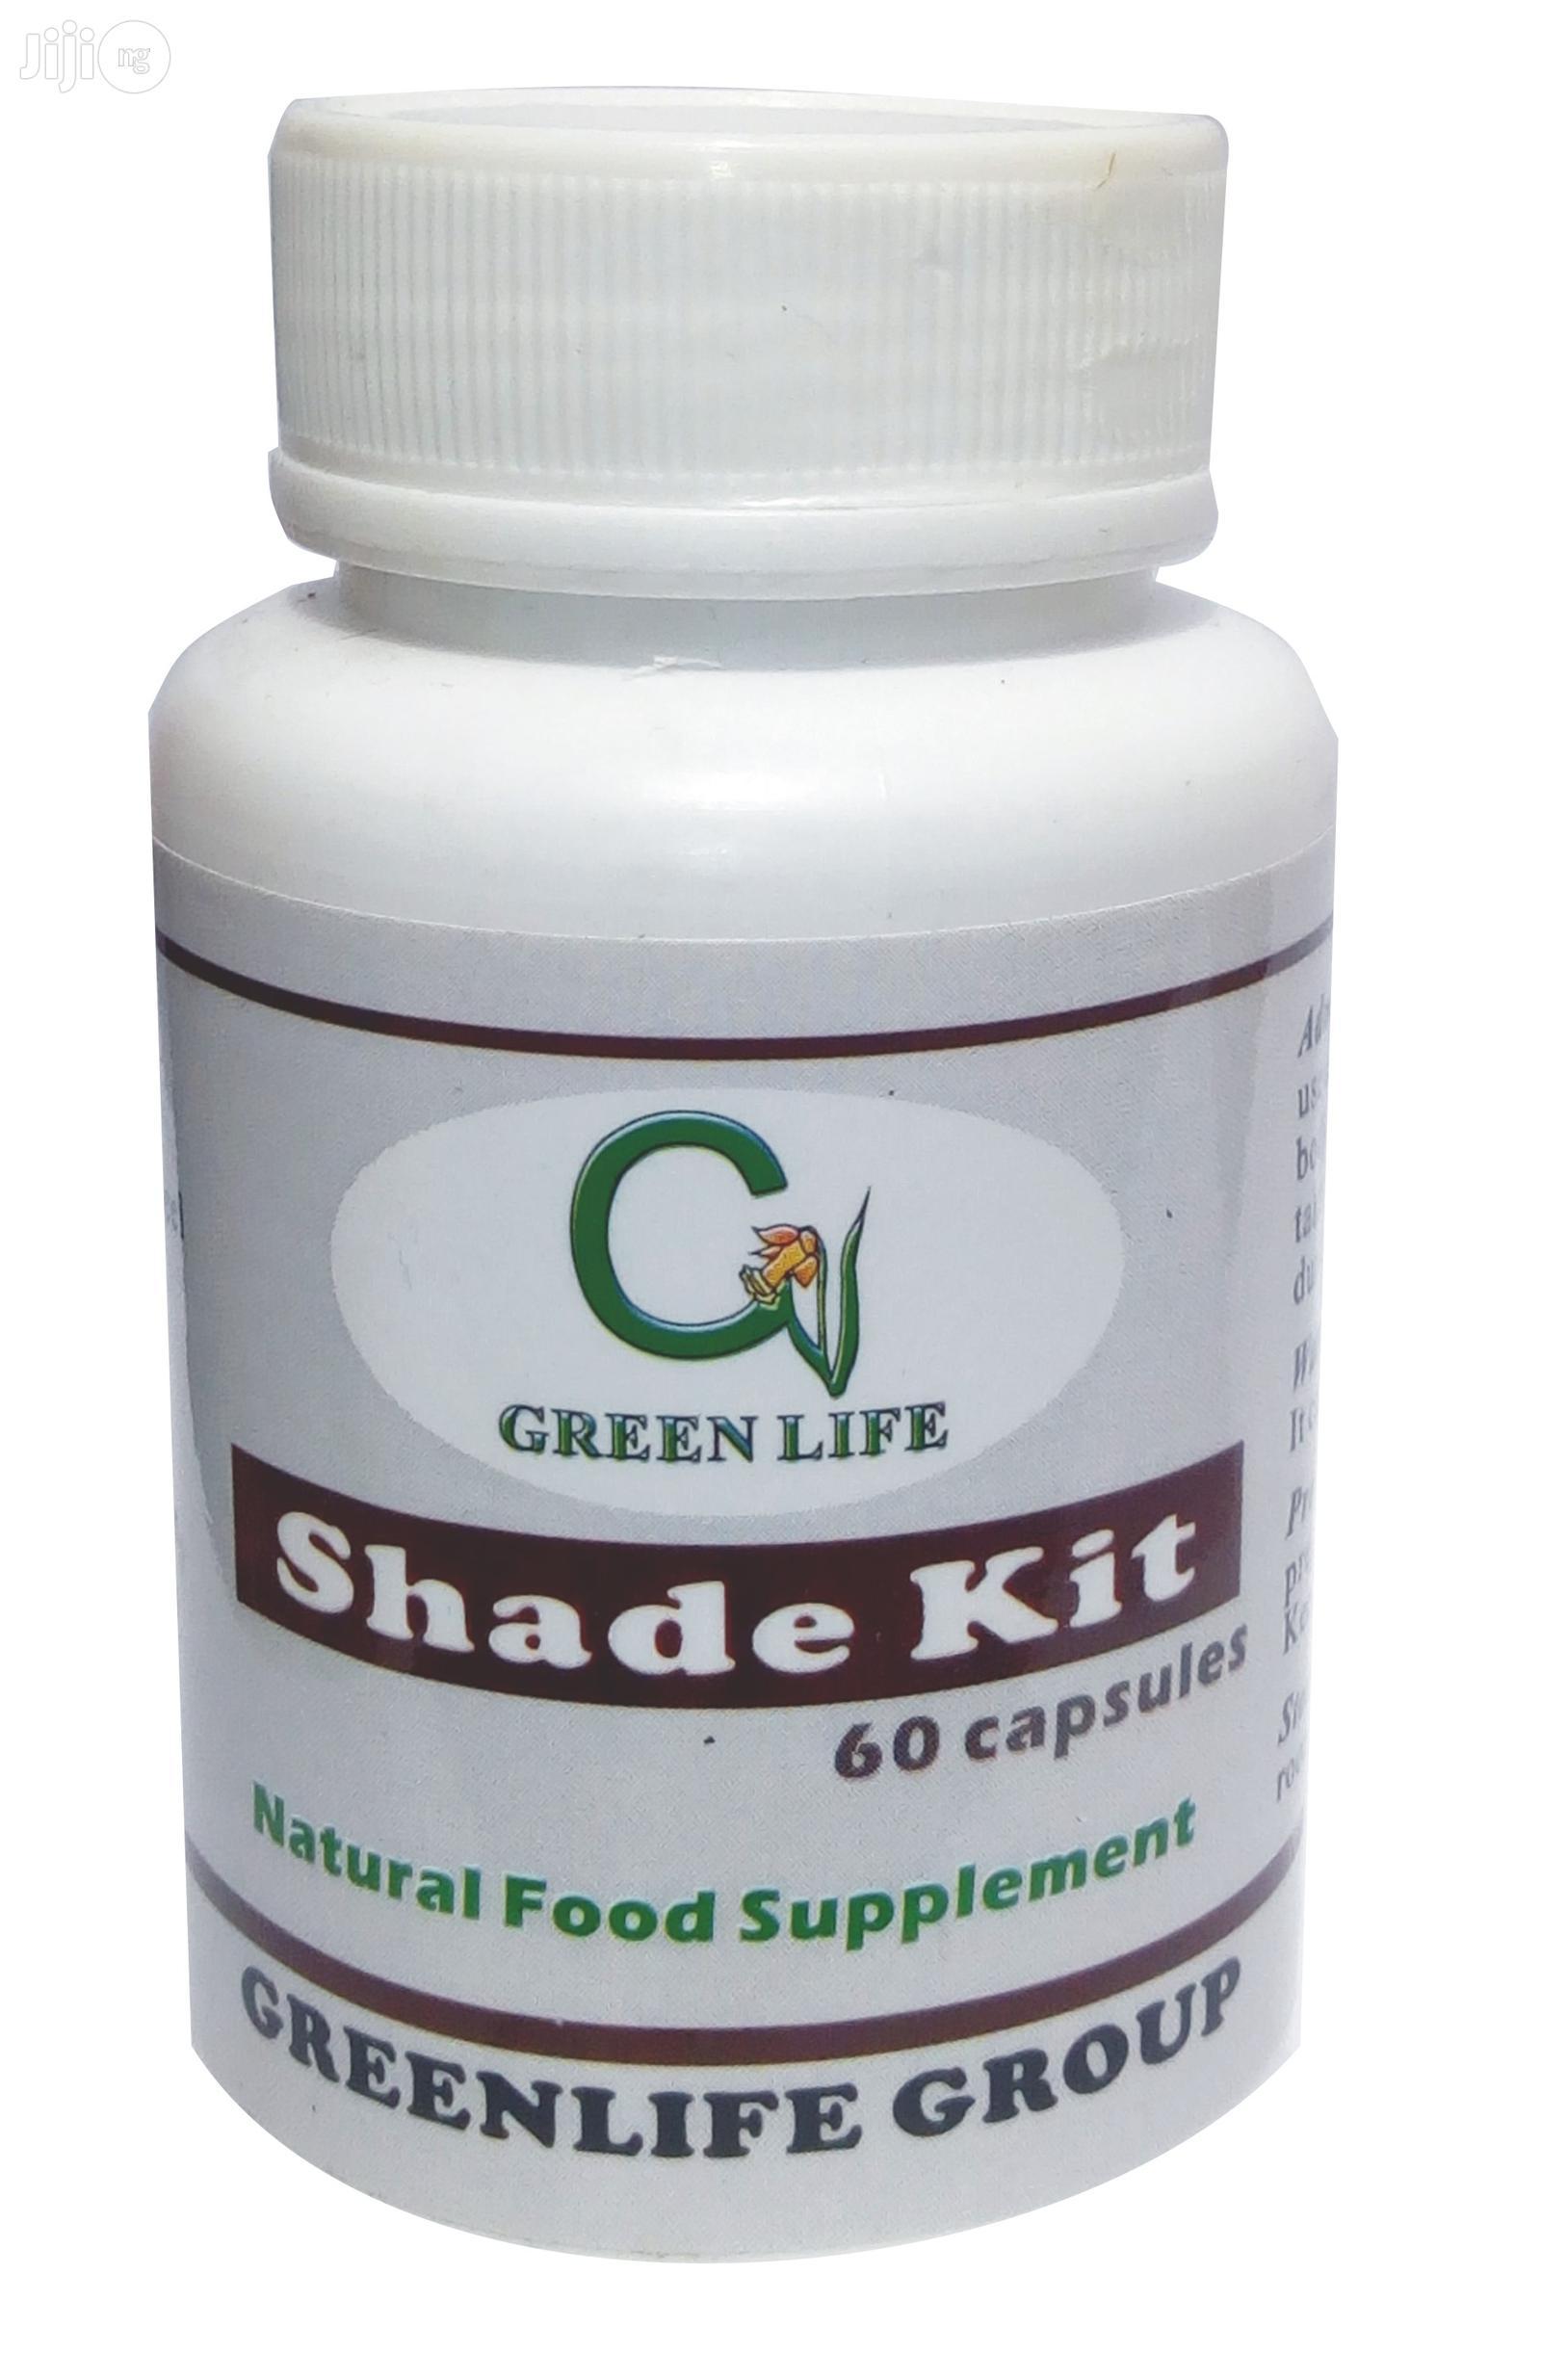 Greenlife Shade Kit - Weight Loss, Perfect Slimming Solution